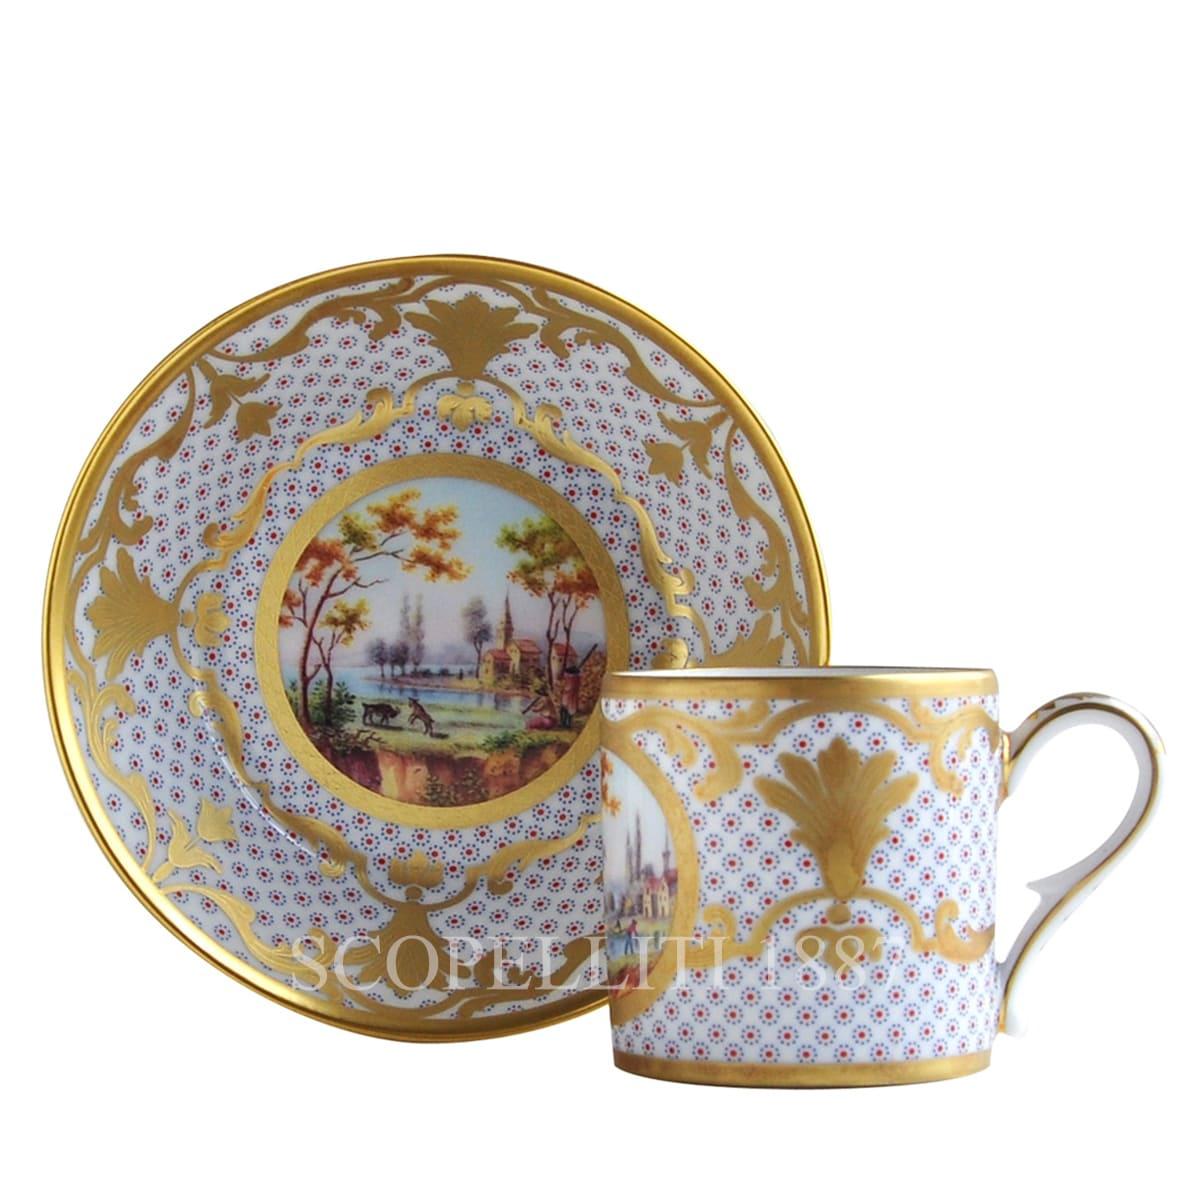 limoges historic royal ceramic